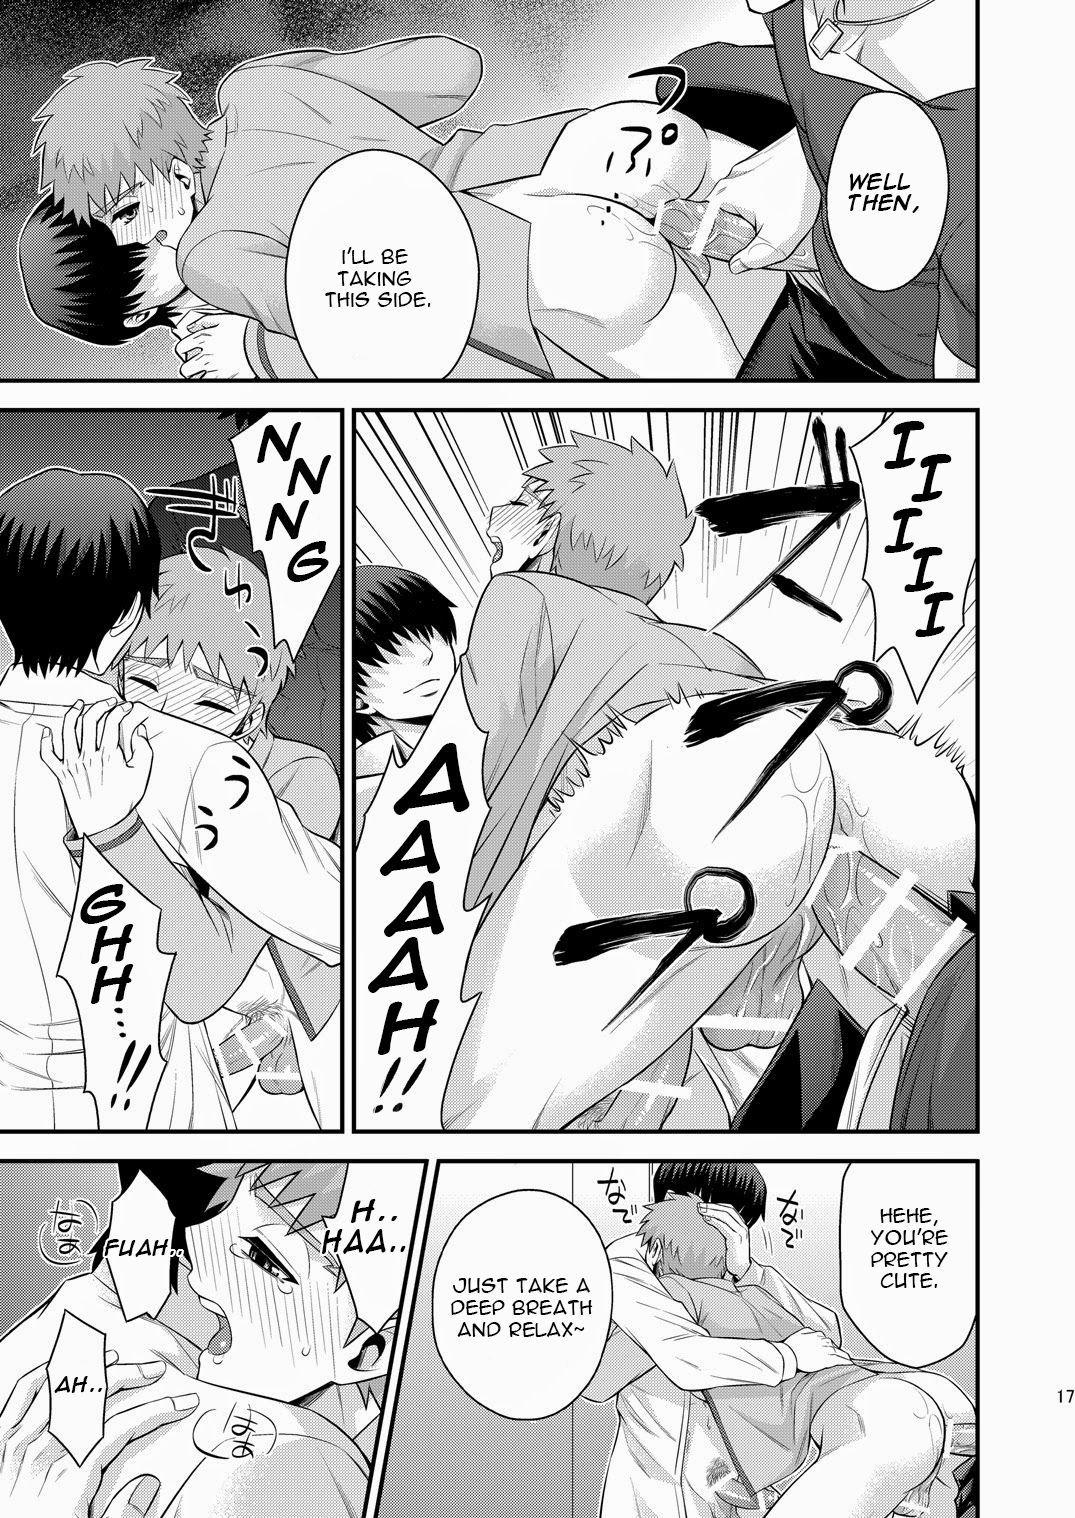 Miyamachou Nichoume no Koushuu Benjo ni Goyoujin!? | Beware of Miyama 2nd Street's Public Toilet!? page 18